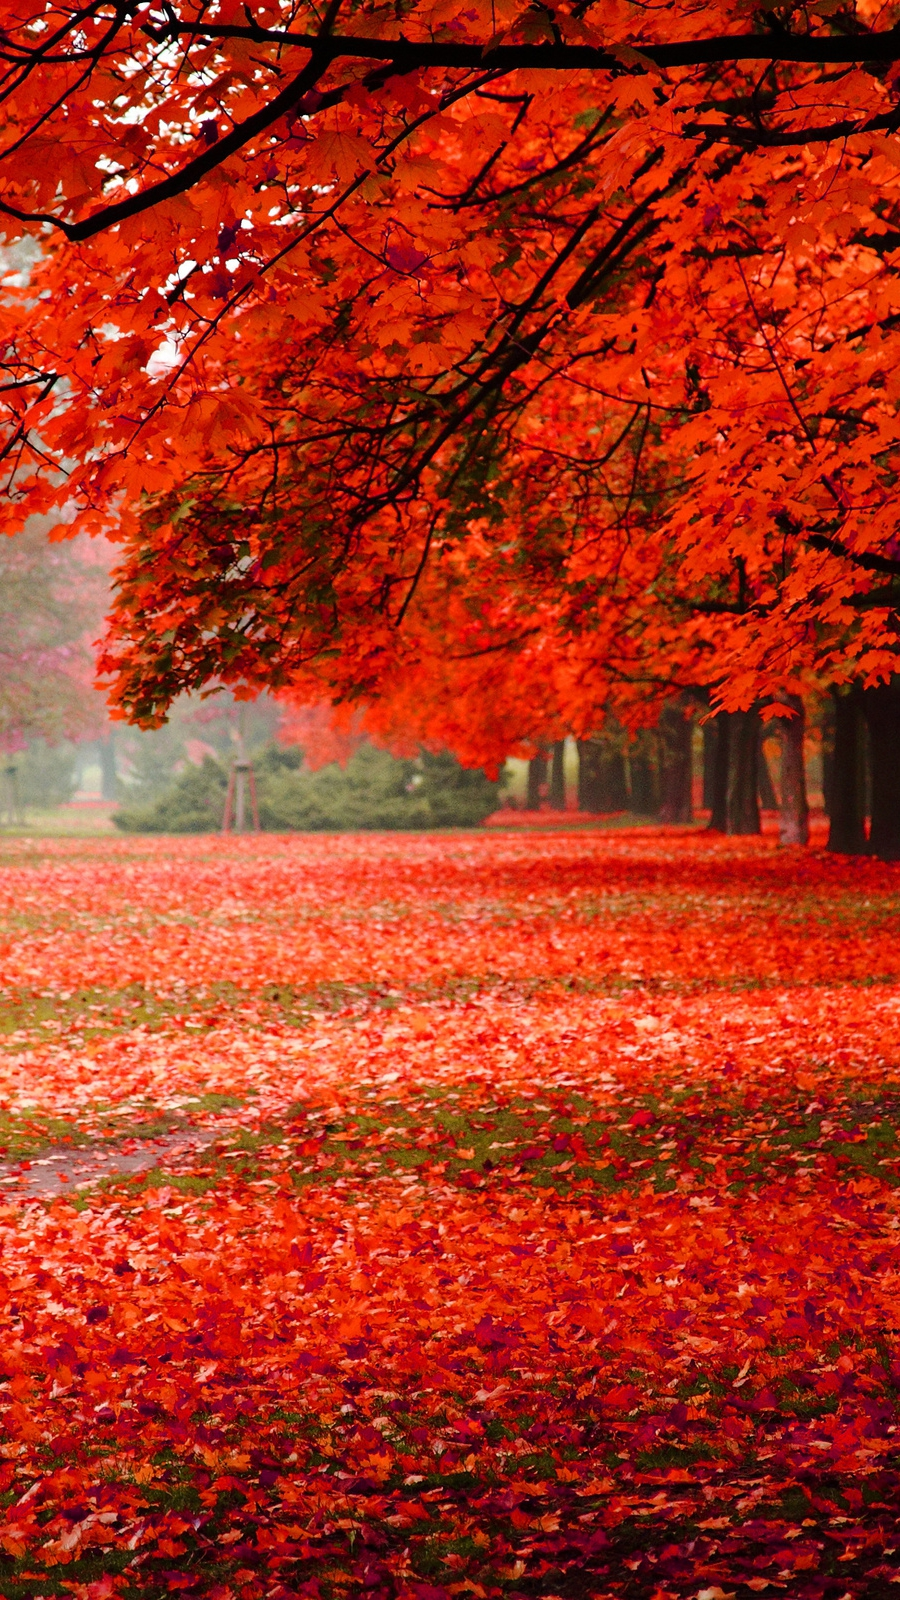 Foliage-autumn-park-nature-iPhone-Wallpaper - iPhone ...